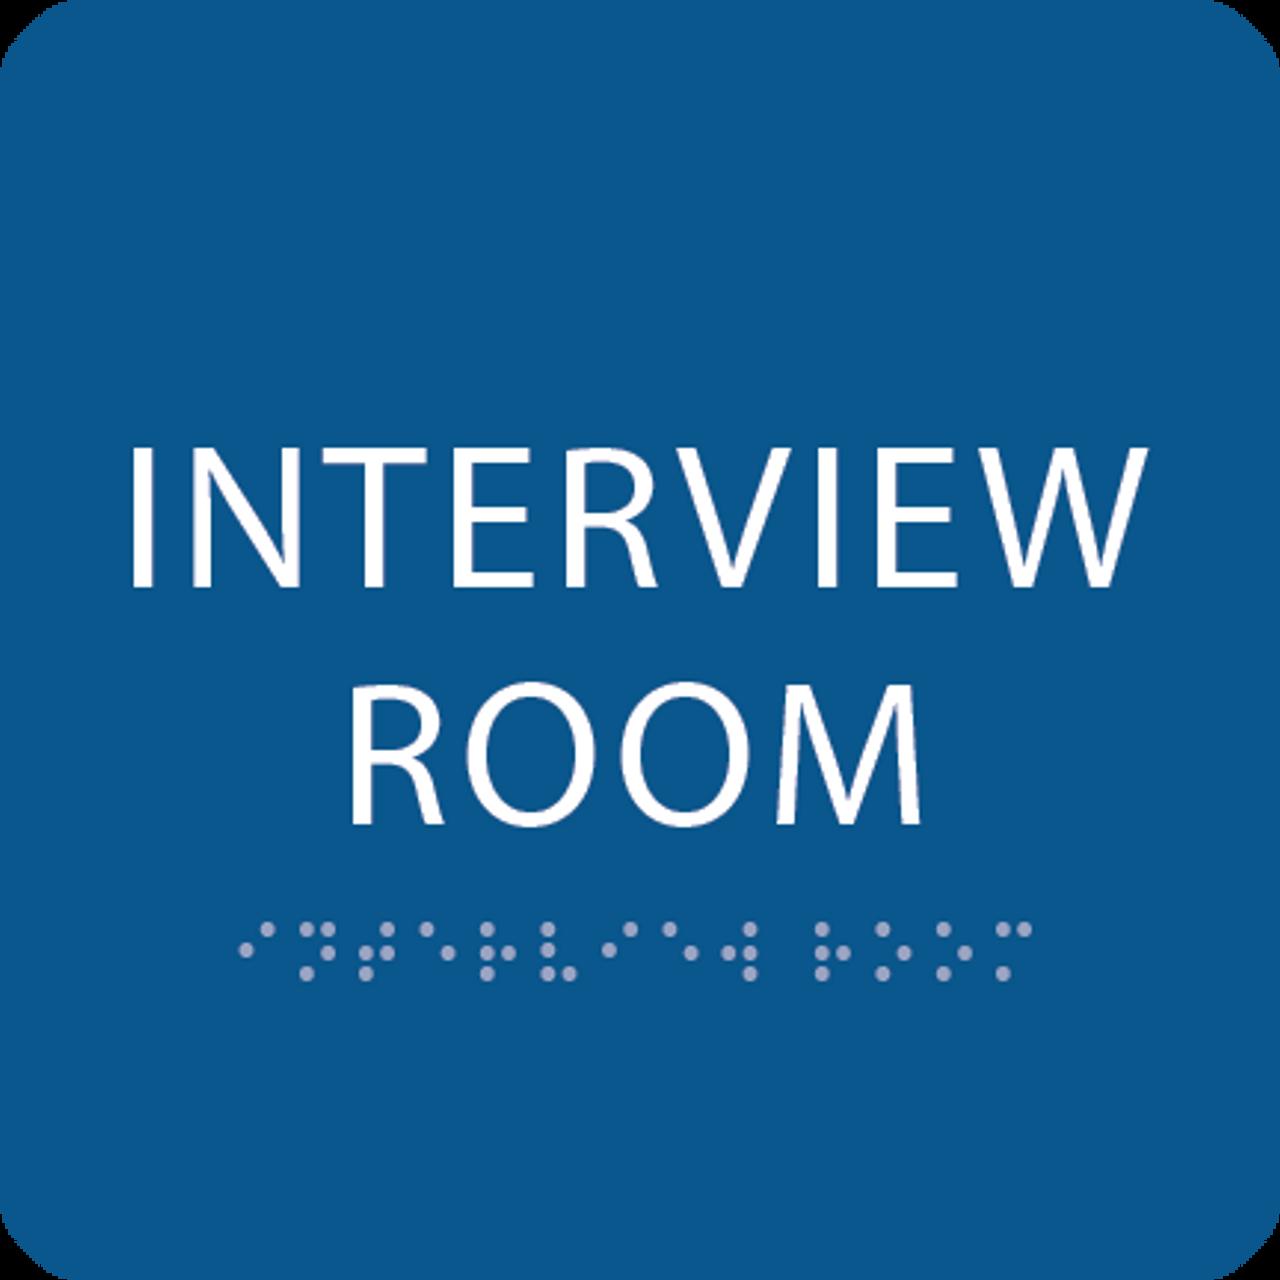 Blue Interview Room ADA Sign